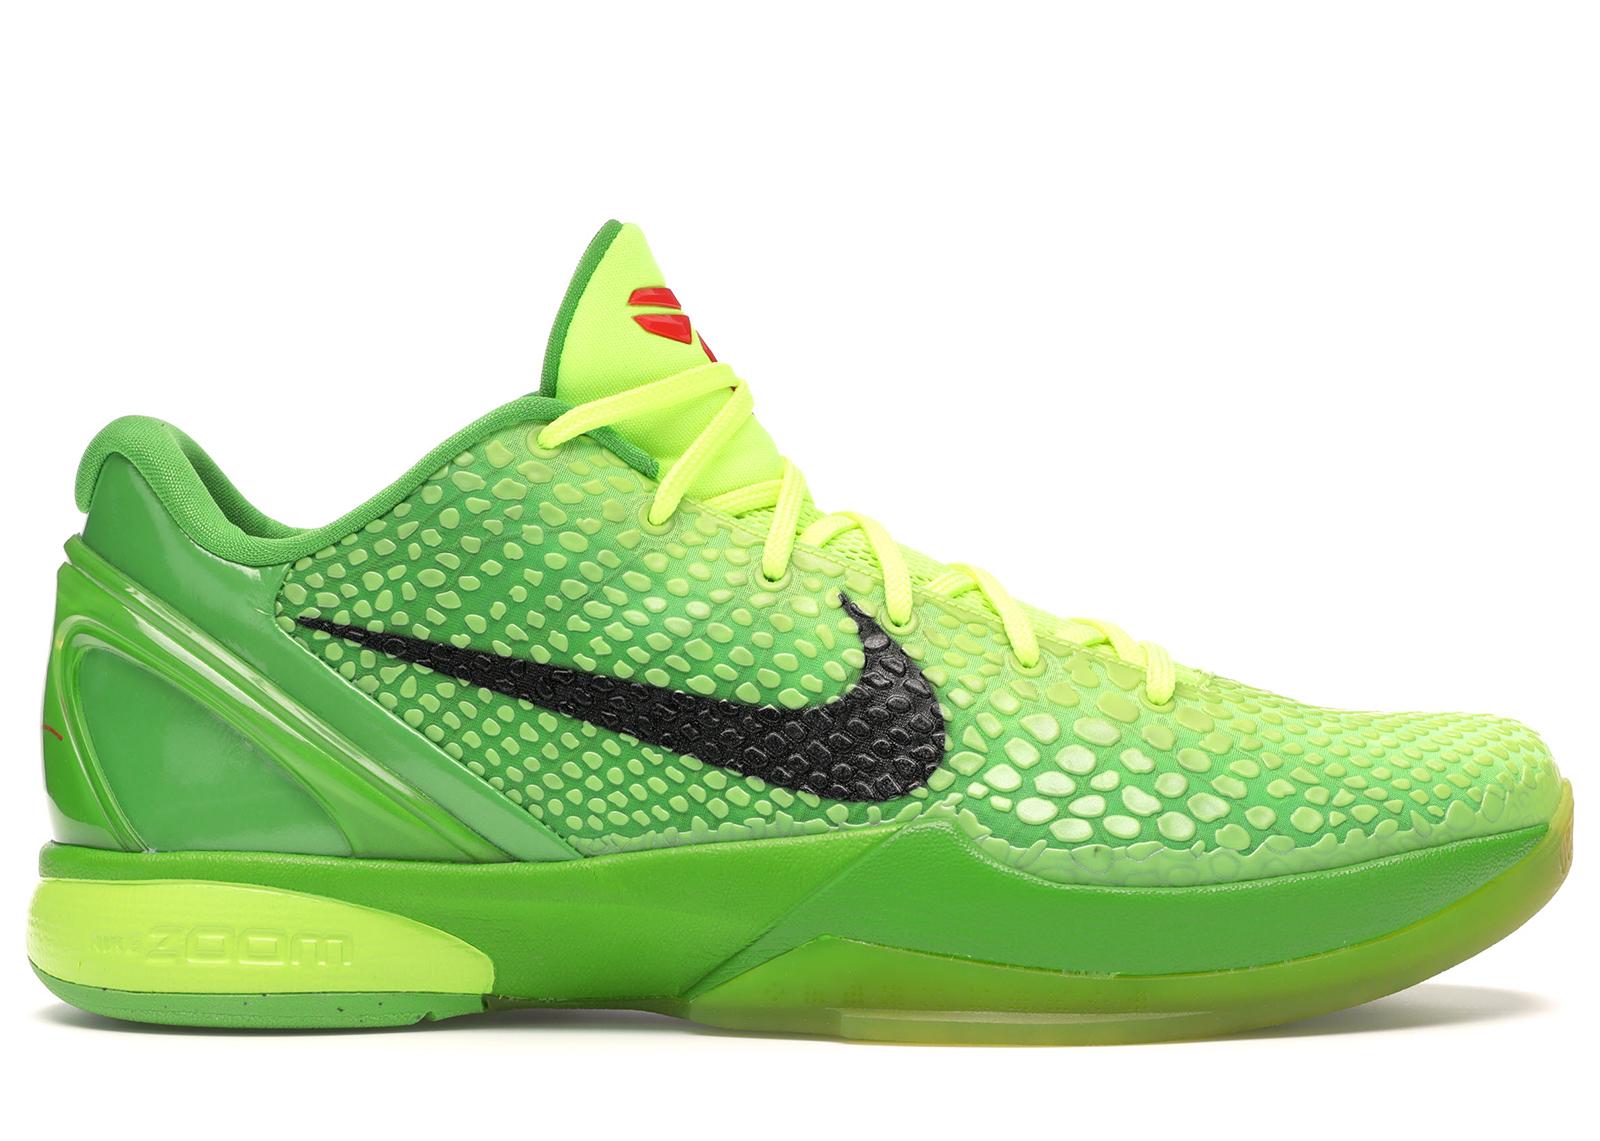 Nike Kobe 6 Grinch (2010) - 429659-701